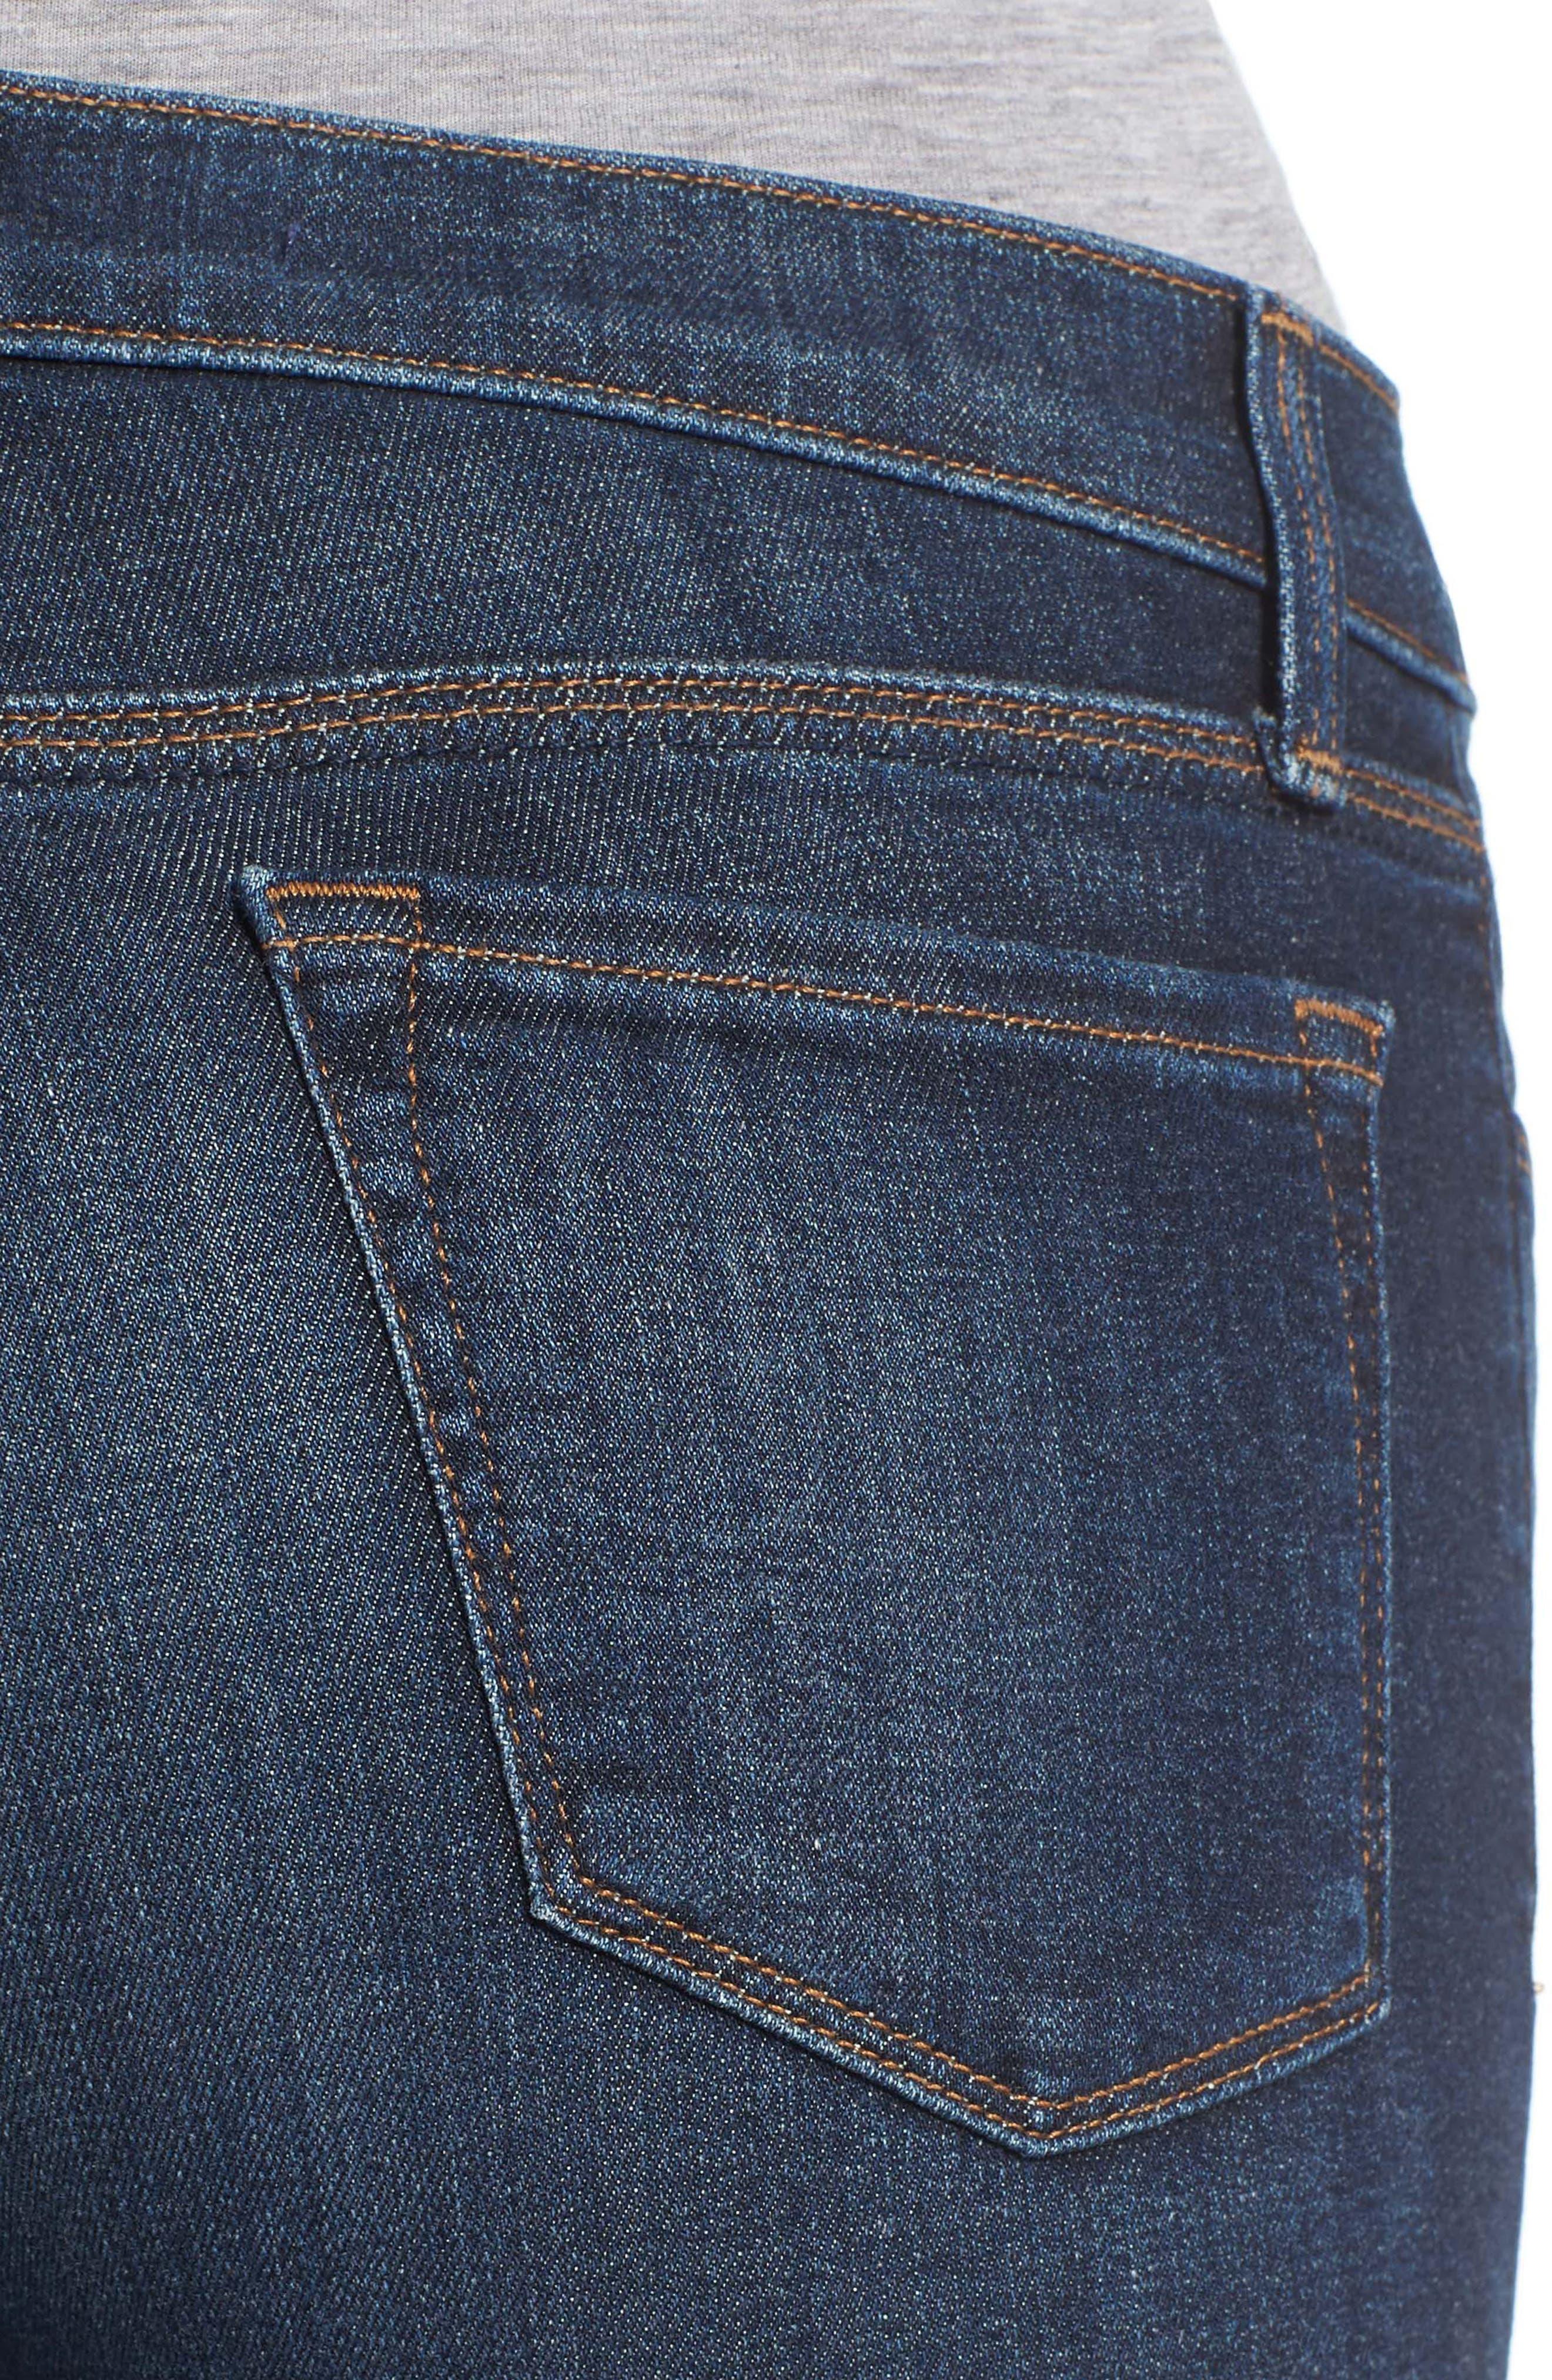 'Maria' Skinny Jeans,                             Alternate thumbnail 5, color,                             407